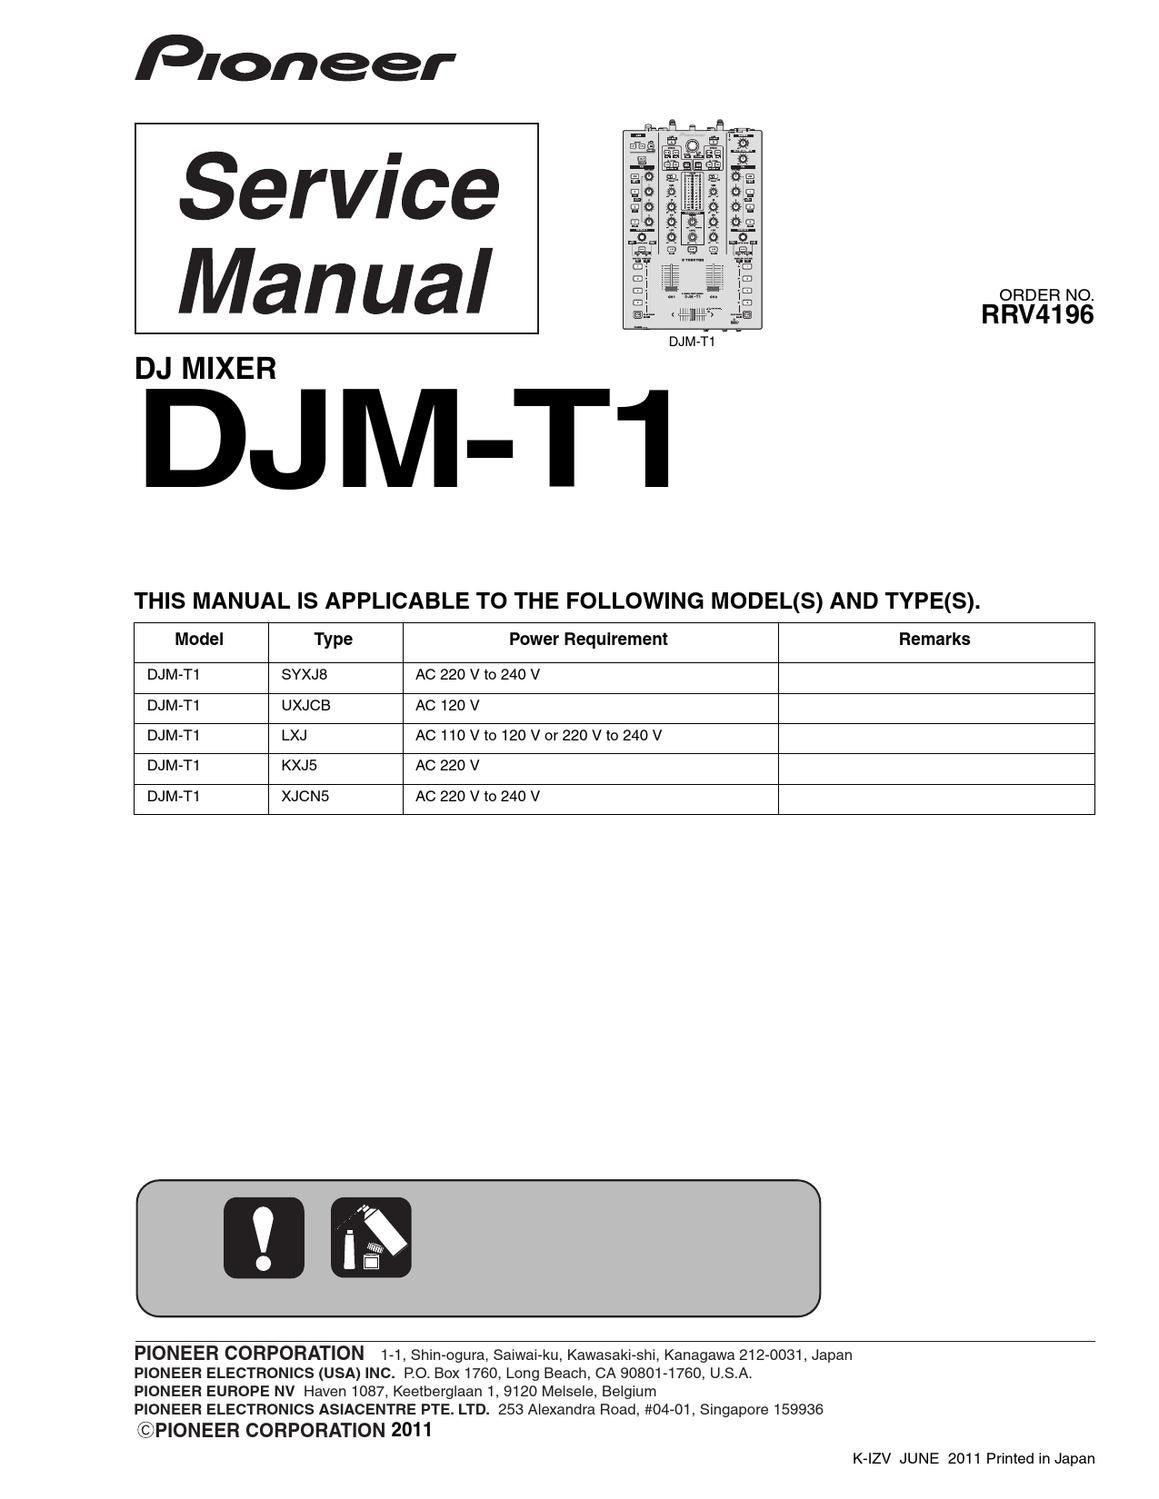 Dj jpg download user manual array pioneer djm t1 service manual by fu3l3r fu3l3r issuu rh issuu fandeluxe Gallery